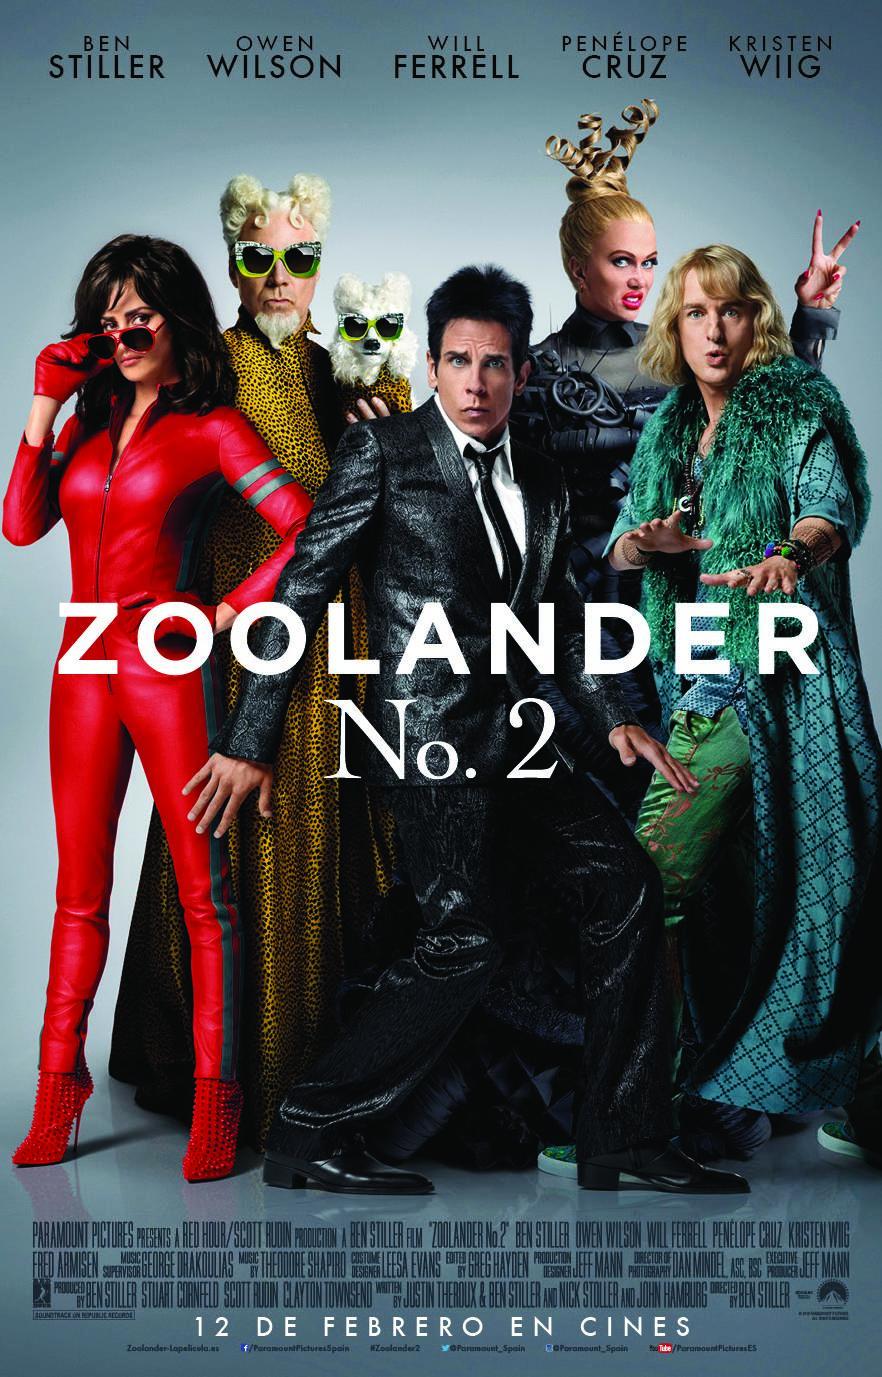 Zoolander 2 clipart freeuse stock Zoolander 2 (2016) 1080p WEBDL x265 500mb - Movies Burg clipart freeuse stock